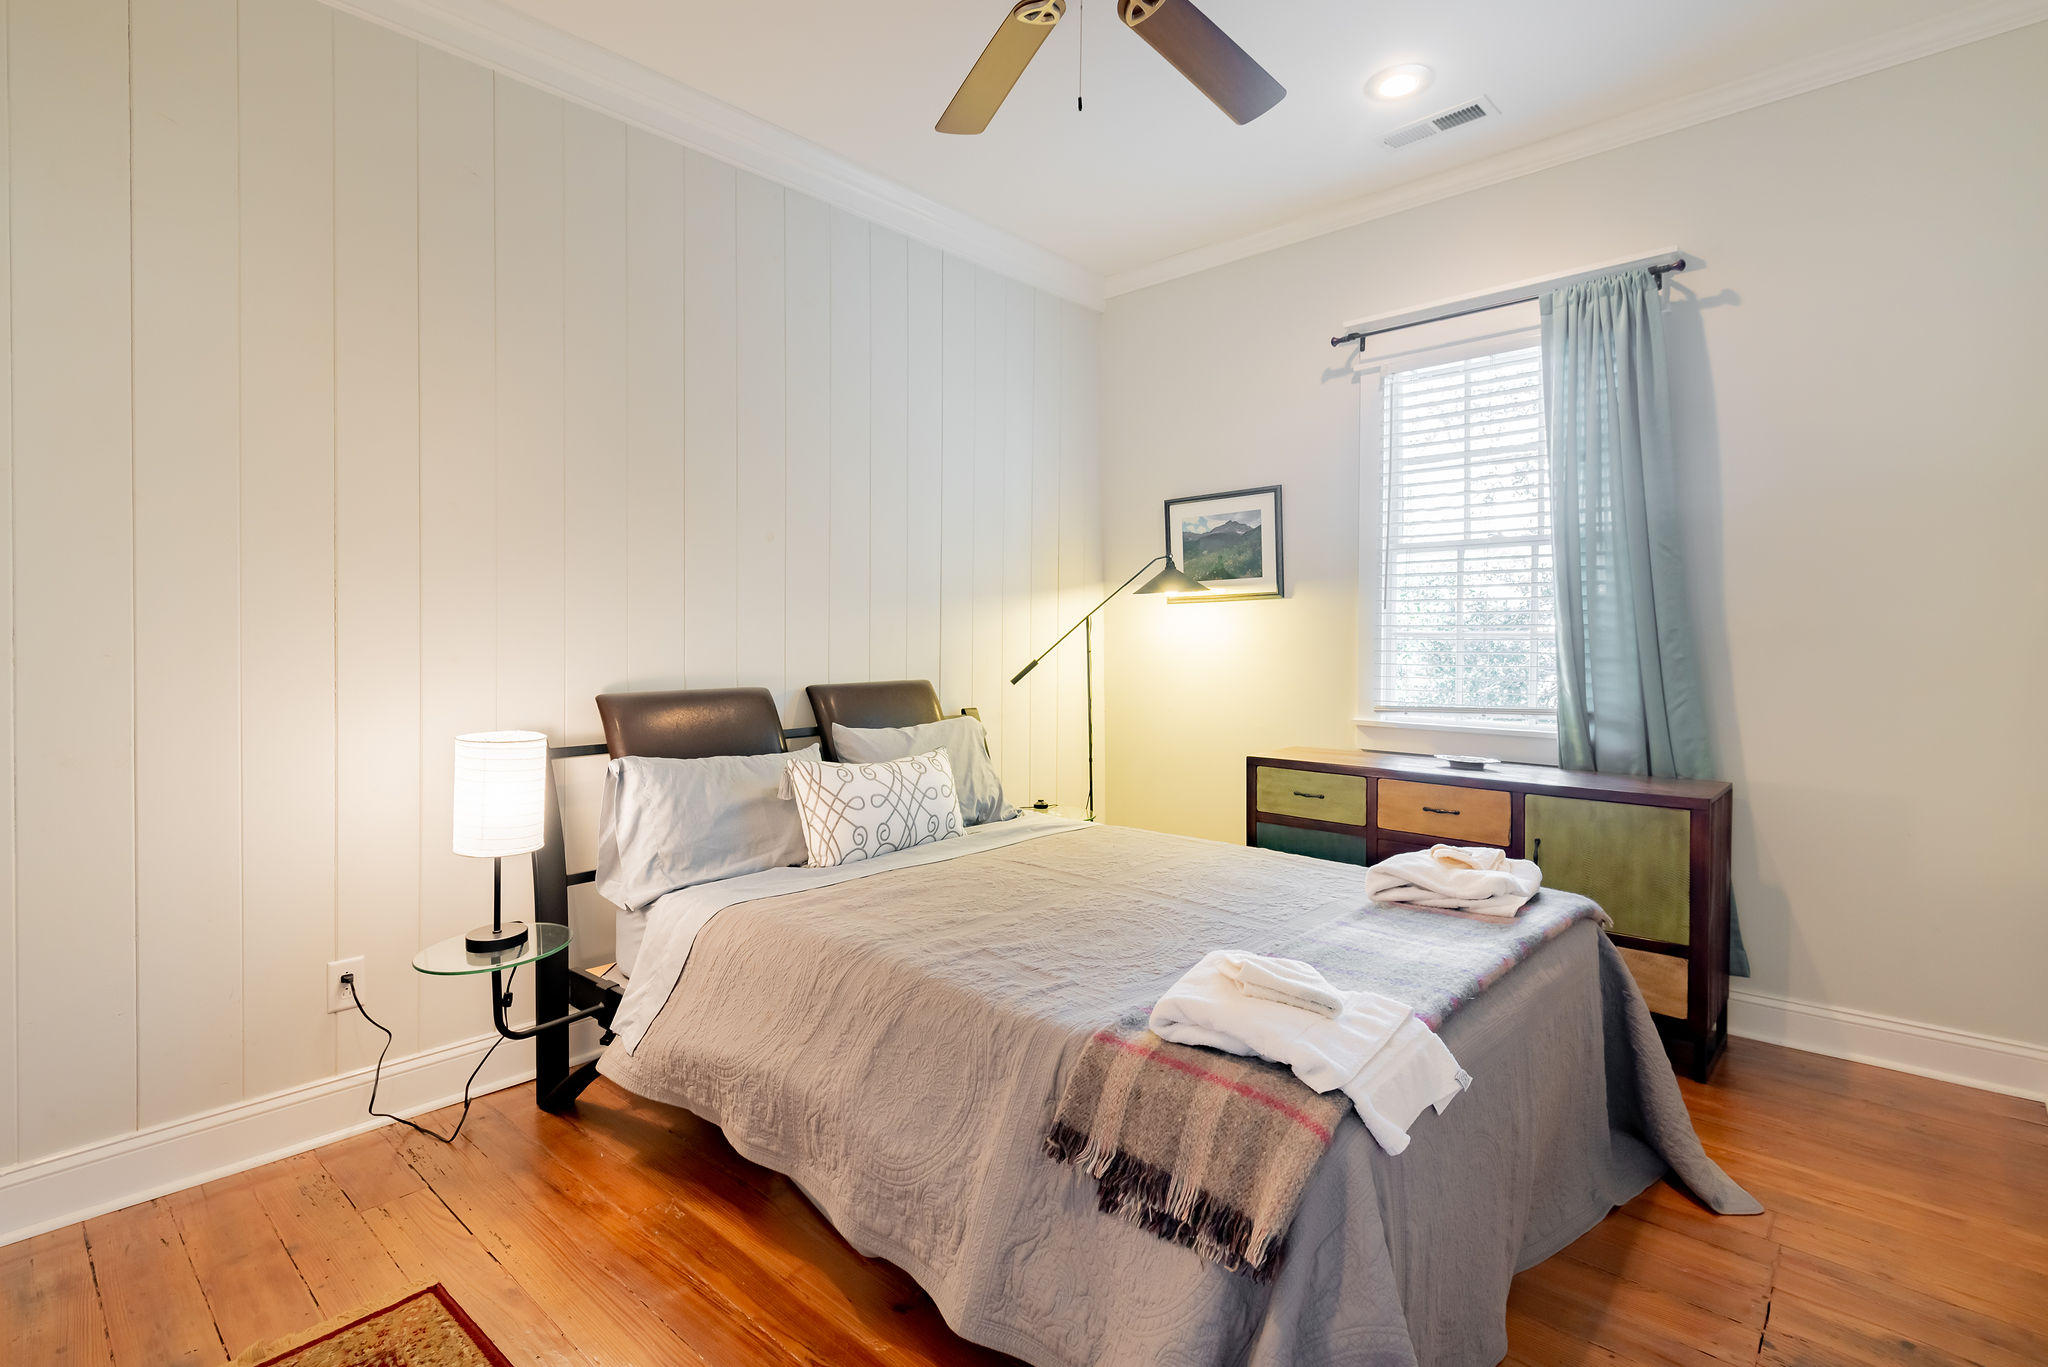 Elliotborough Homes For Sale - 29 Sires, Charleston, SC - 9